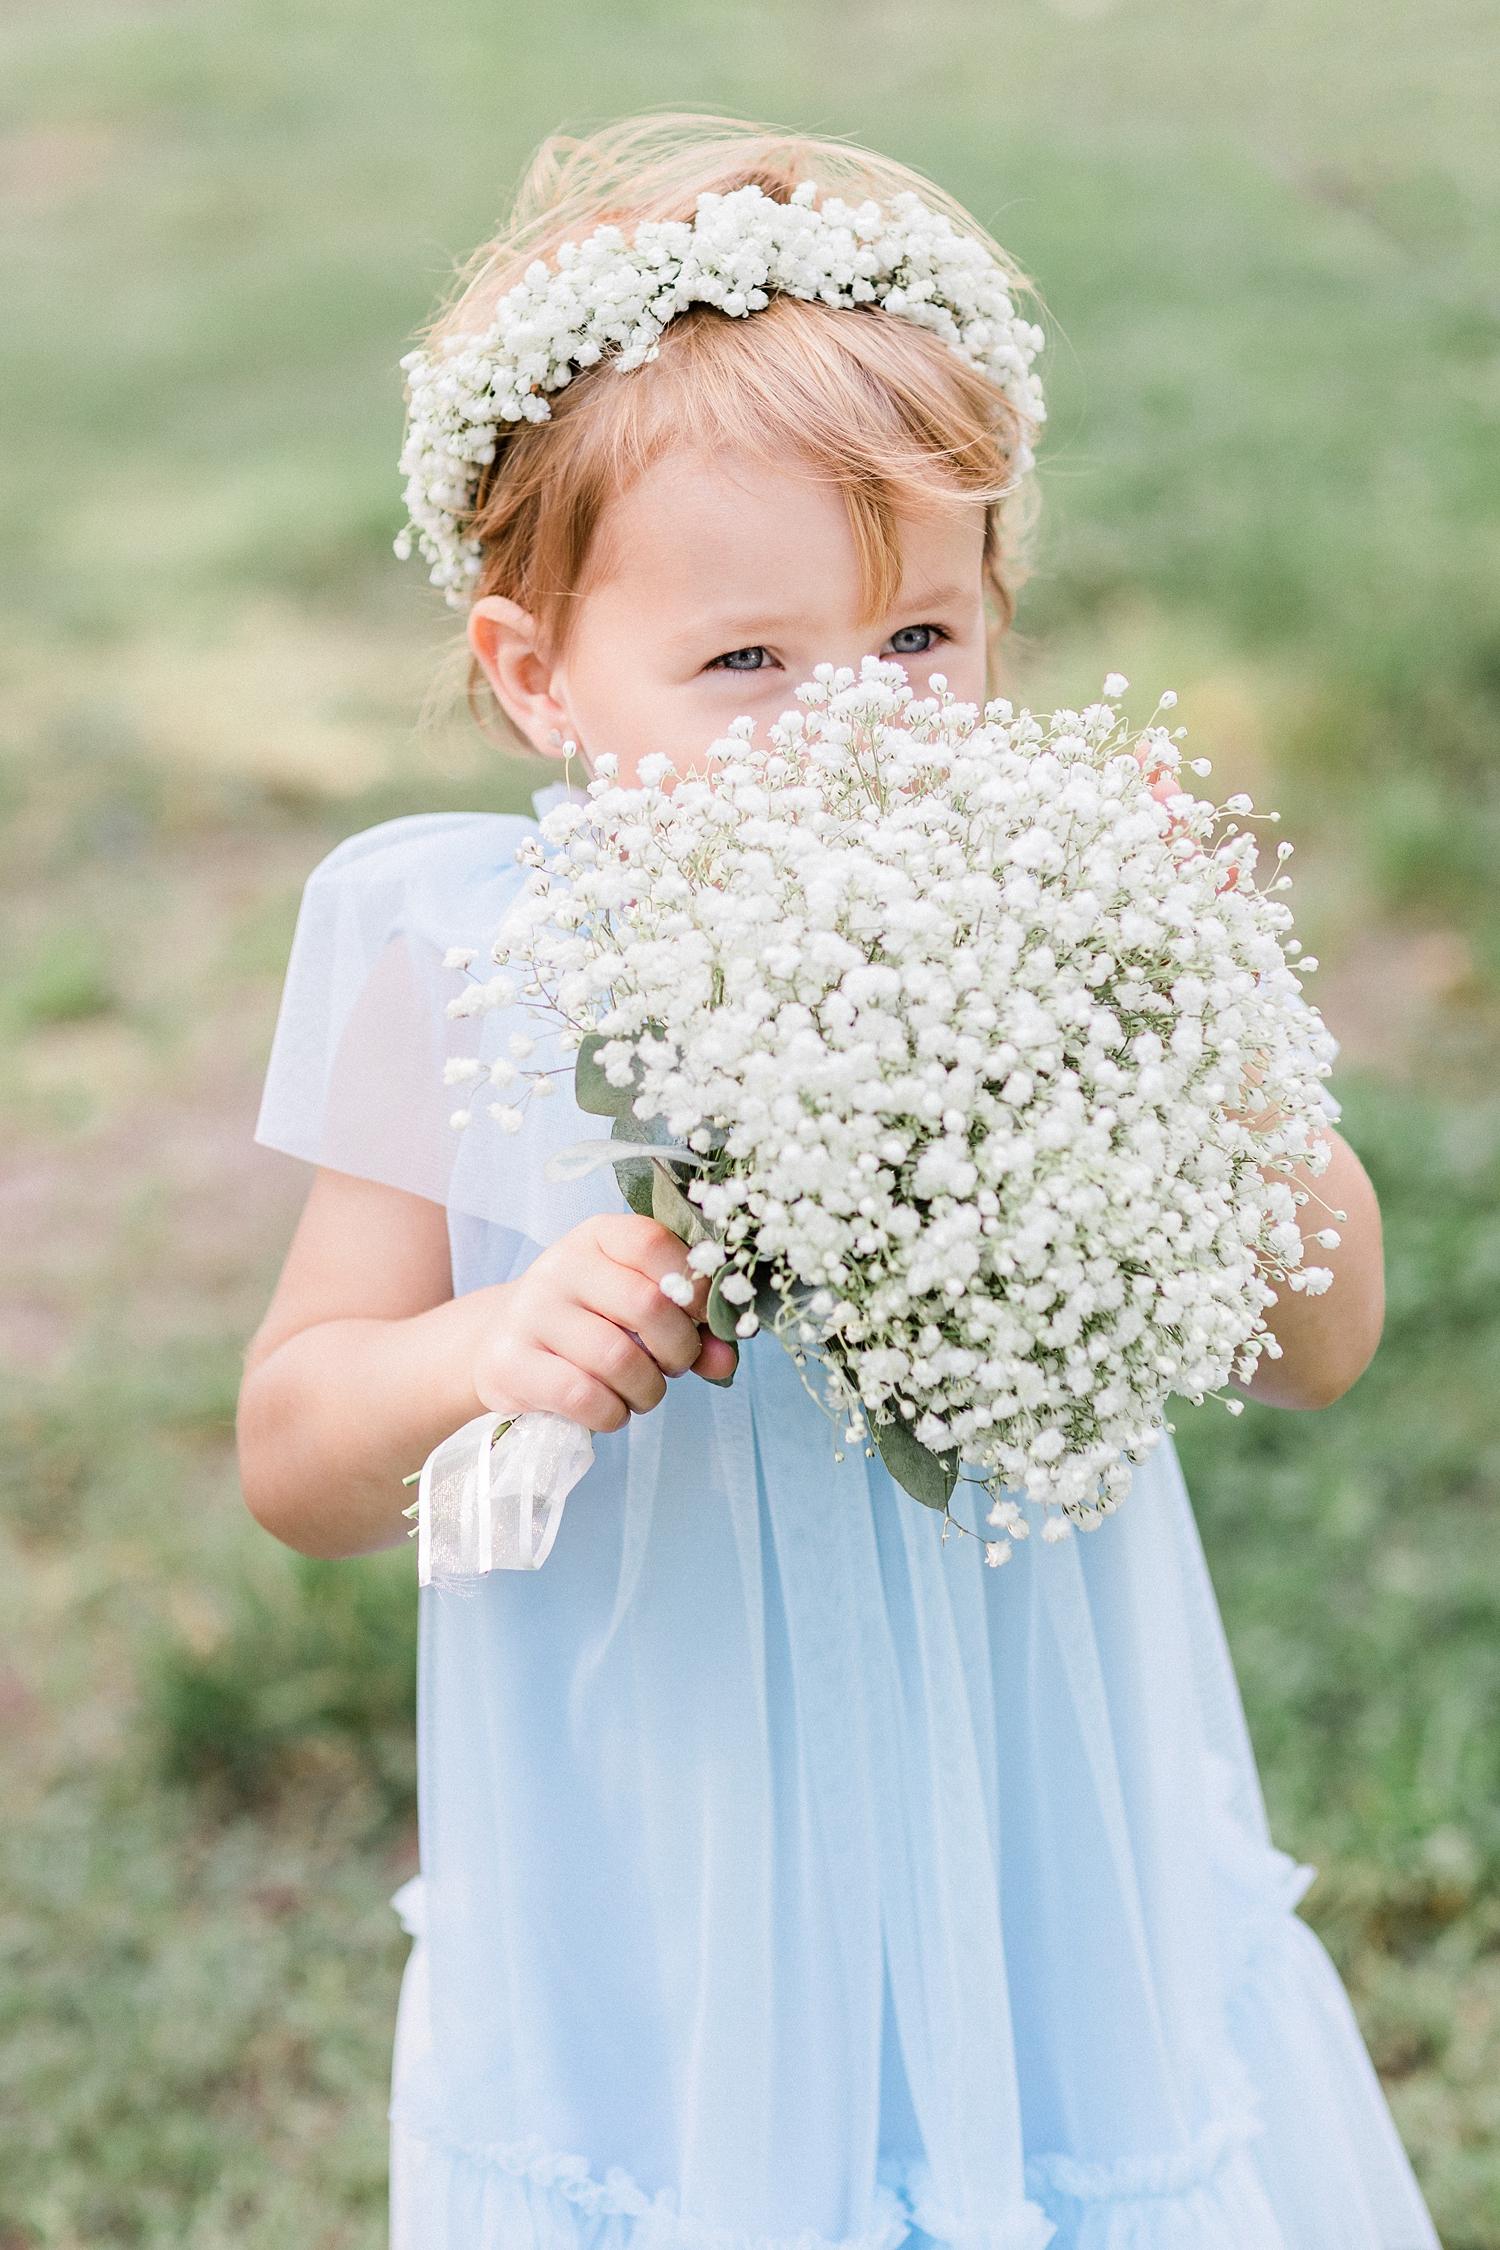 Flower girl holding bunch of baby's breath - photo by Jurgita Lukos Photography